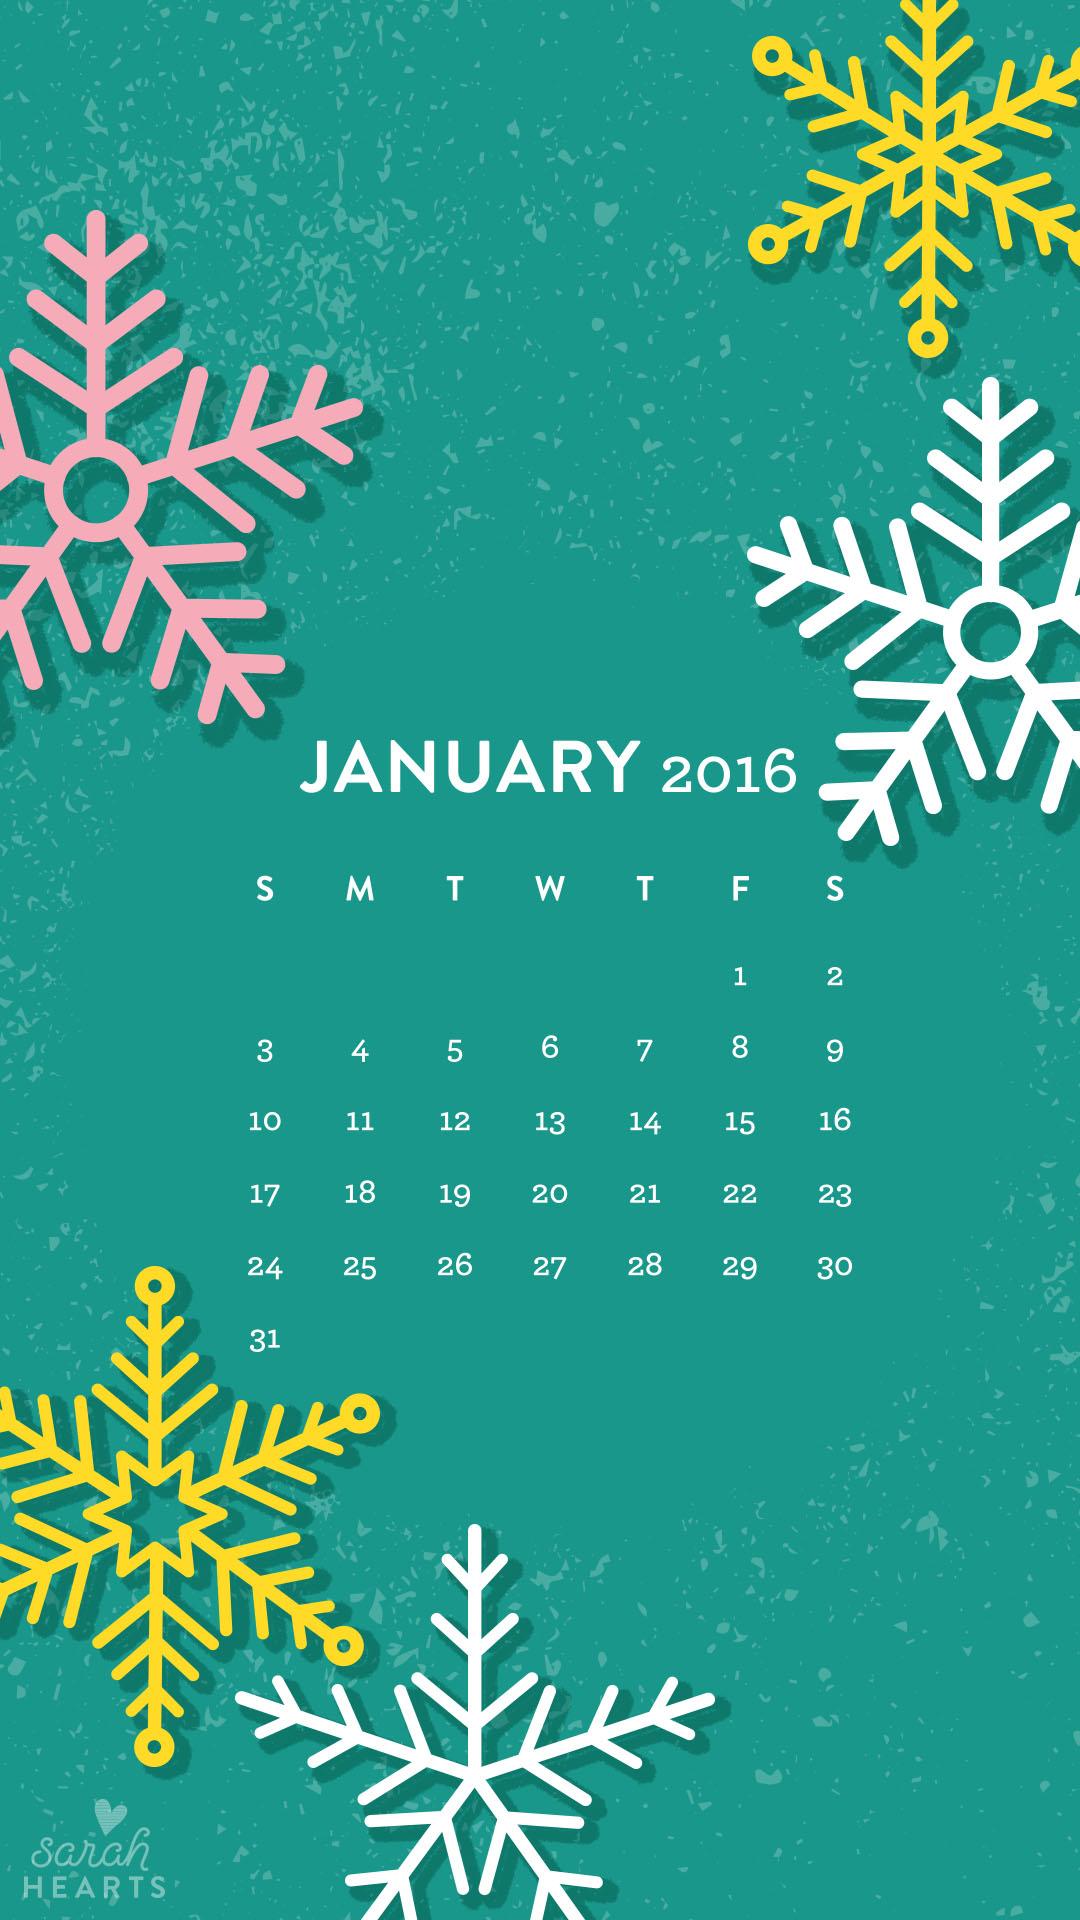 Iphone wallpaper the dress decoded - 01 2016 Iphone Calendar